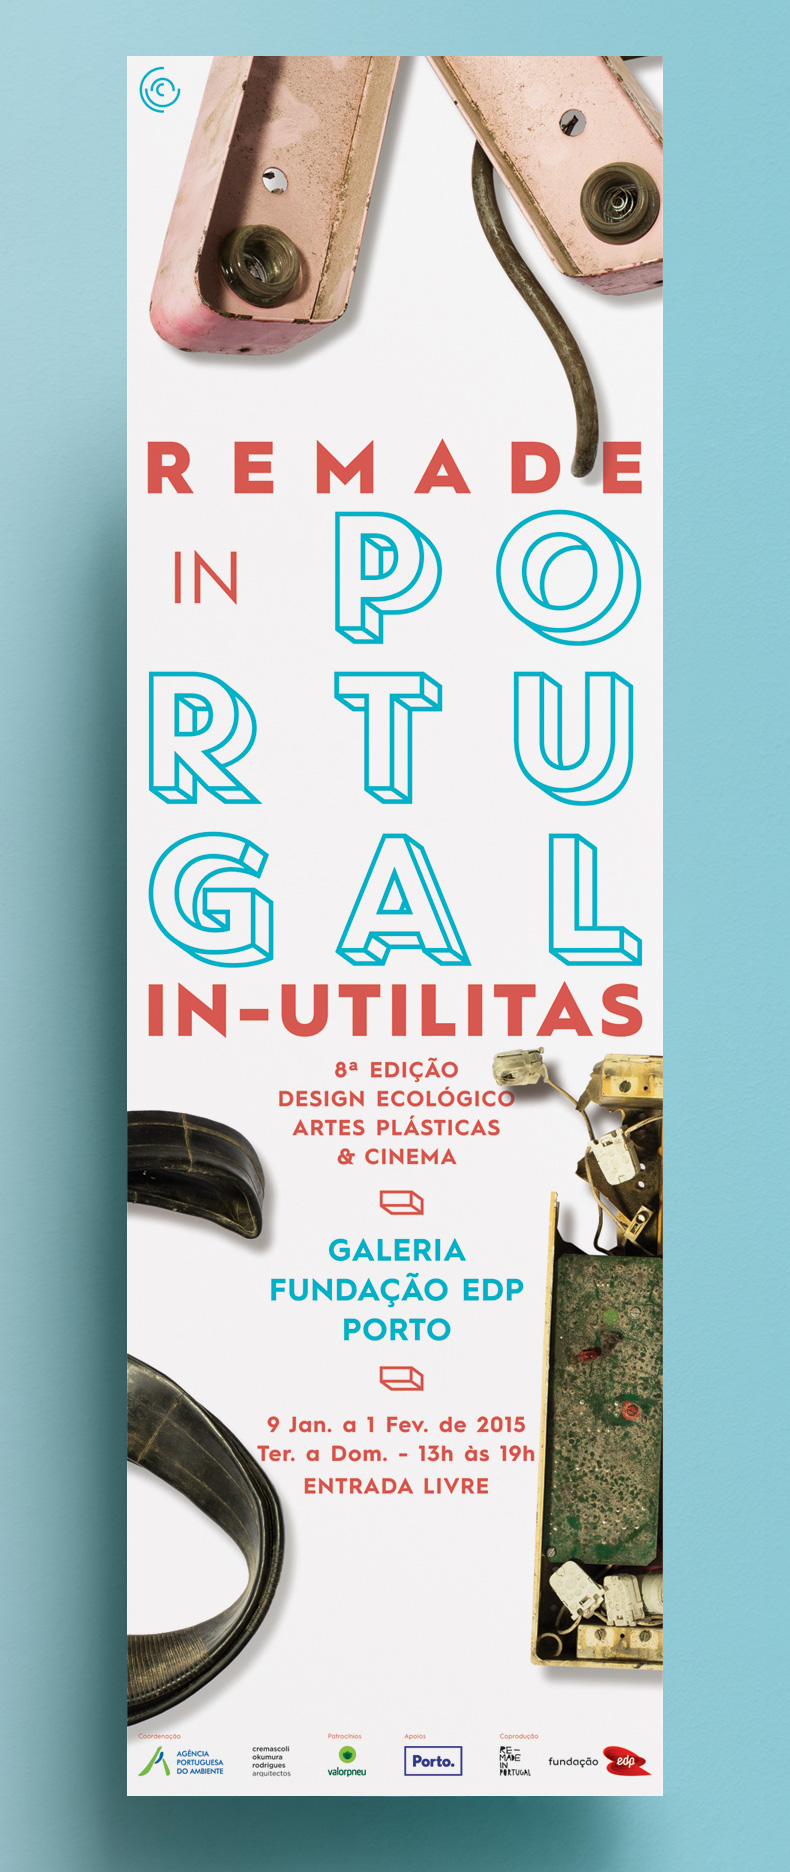 paulo-patricio-remade-in-portugal-in-utilitas-2015-05